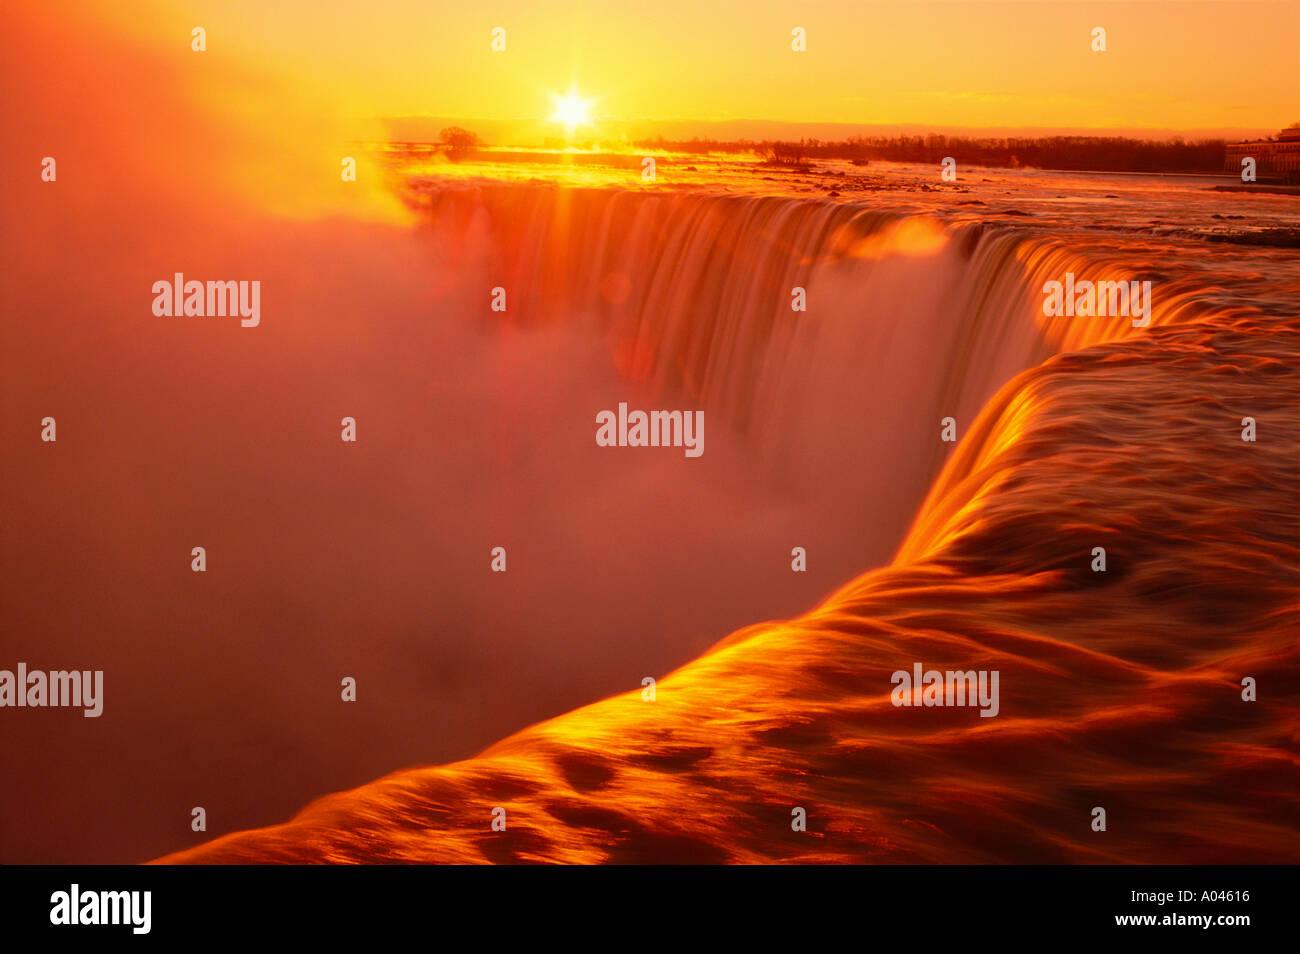 Canada Ontario Niagara Falls sunrise over Niagara Falls - Stock Image